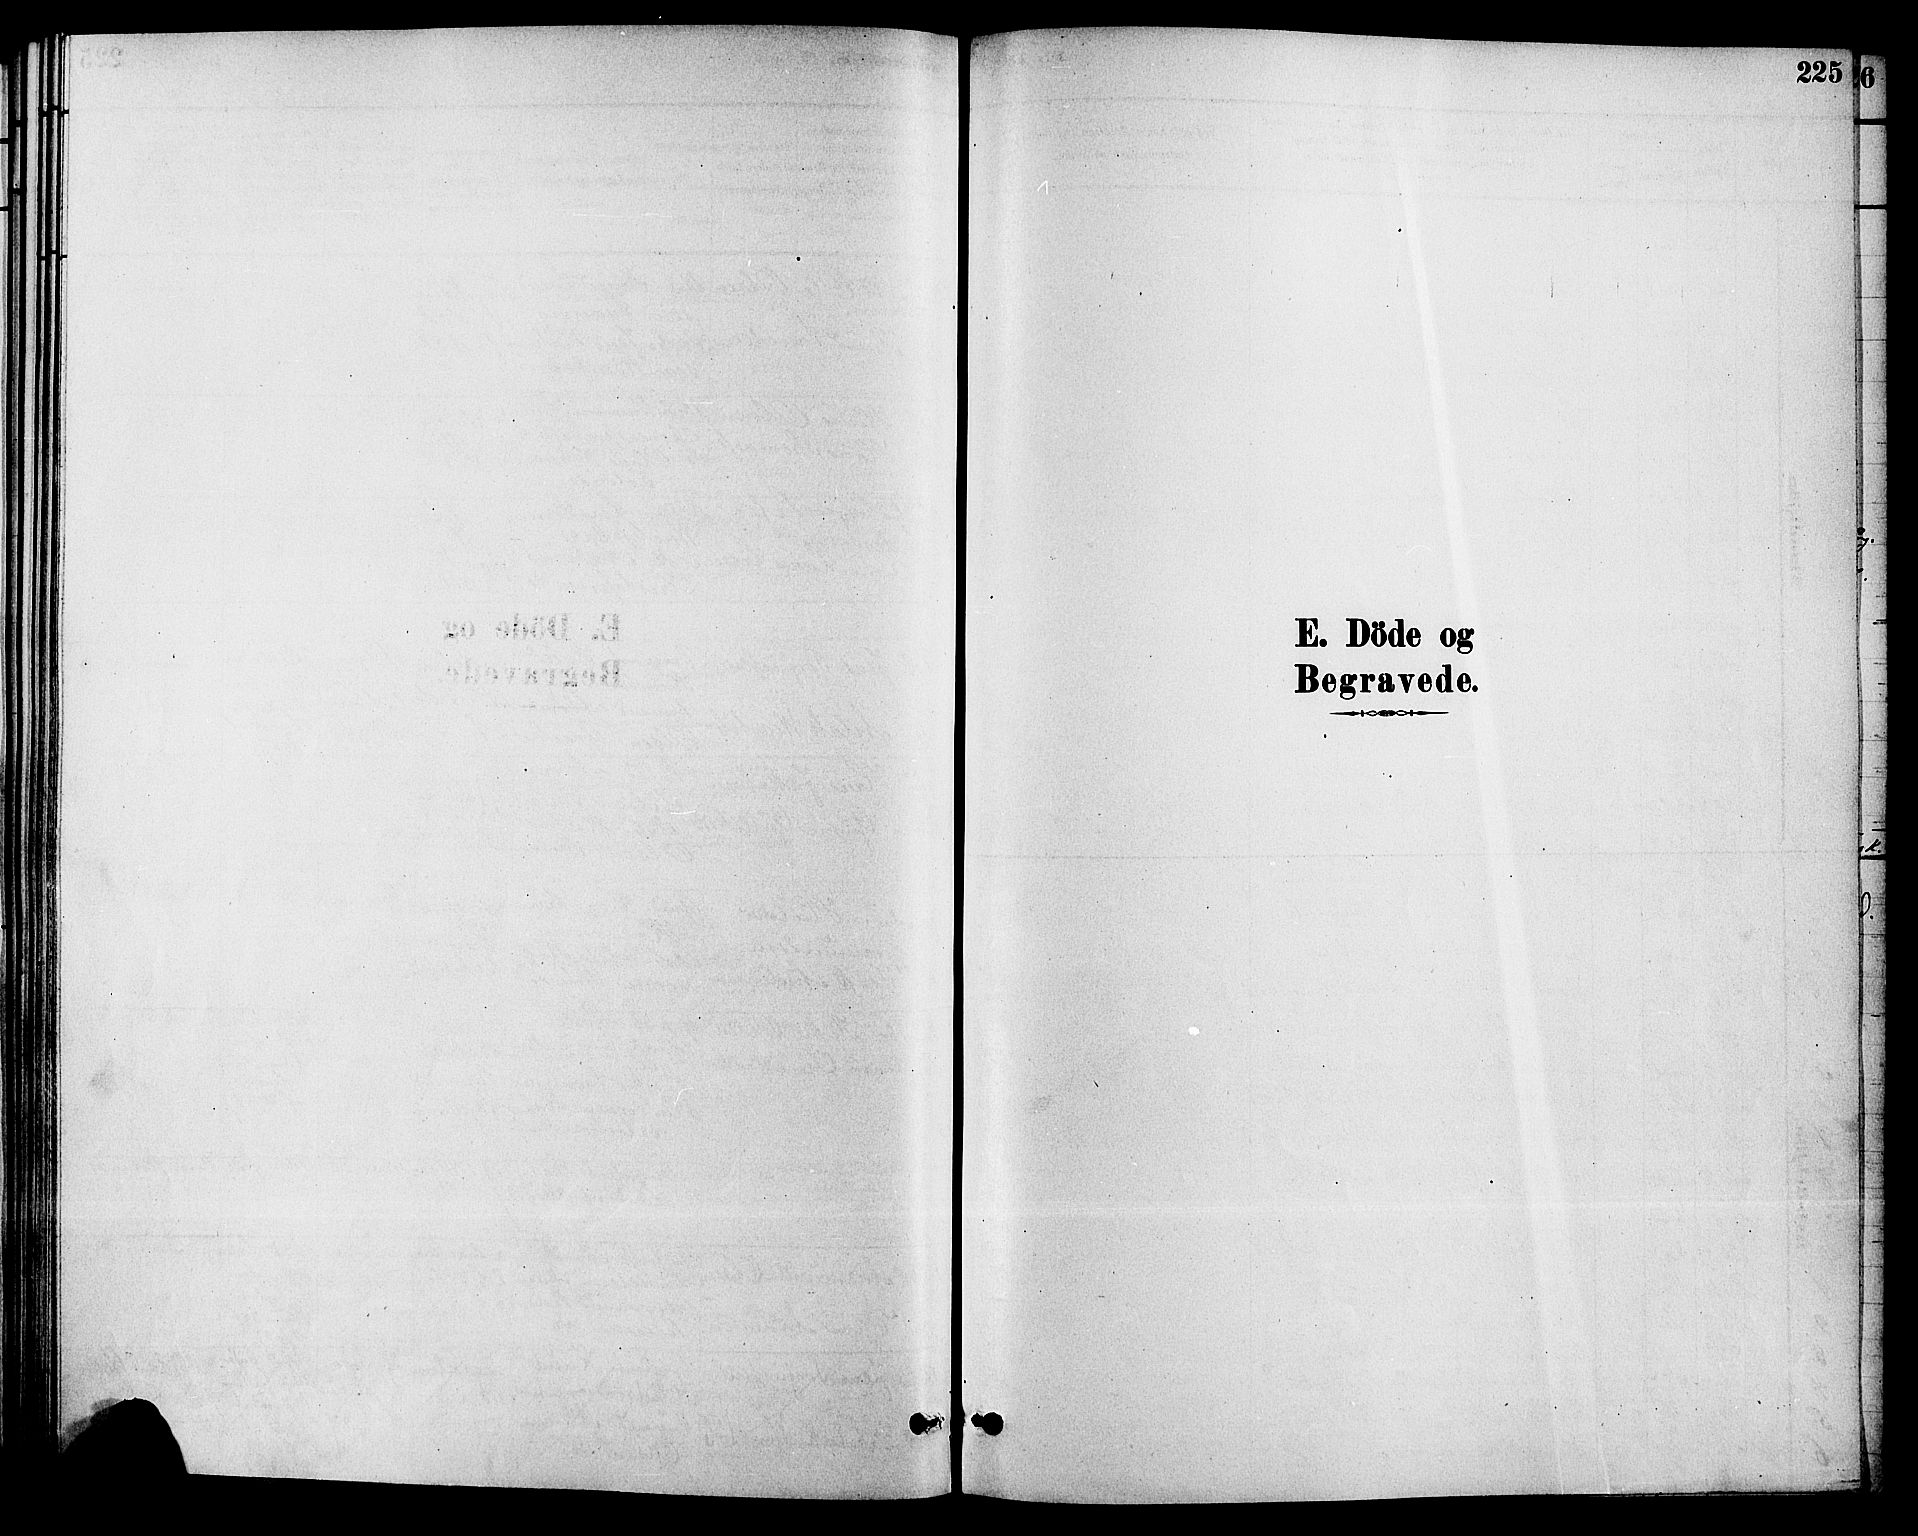 SAKO, Solum kirkebøker, F/Fa/L0009: Ministerialbok nr. I 9, 1877-1887, s. 225